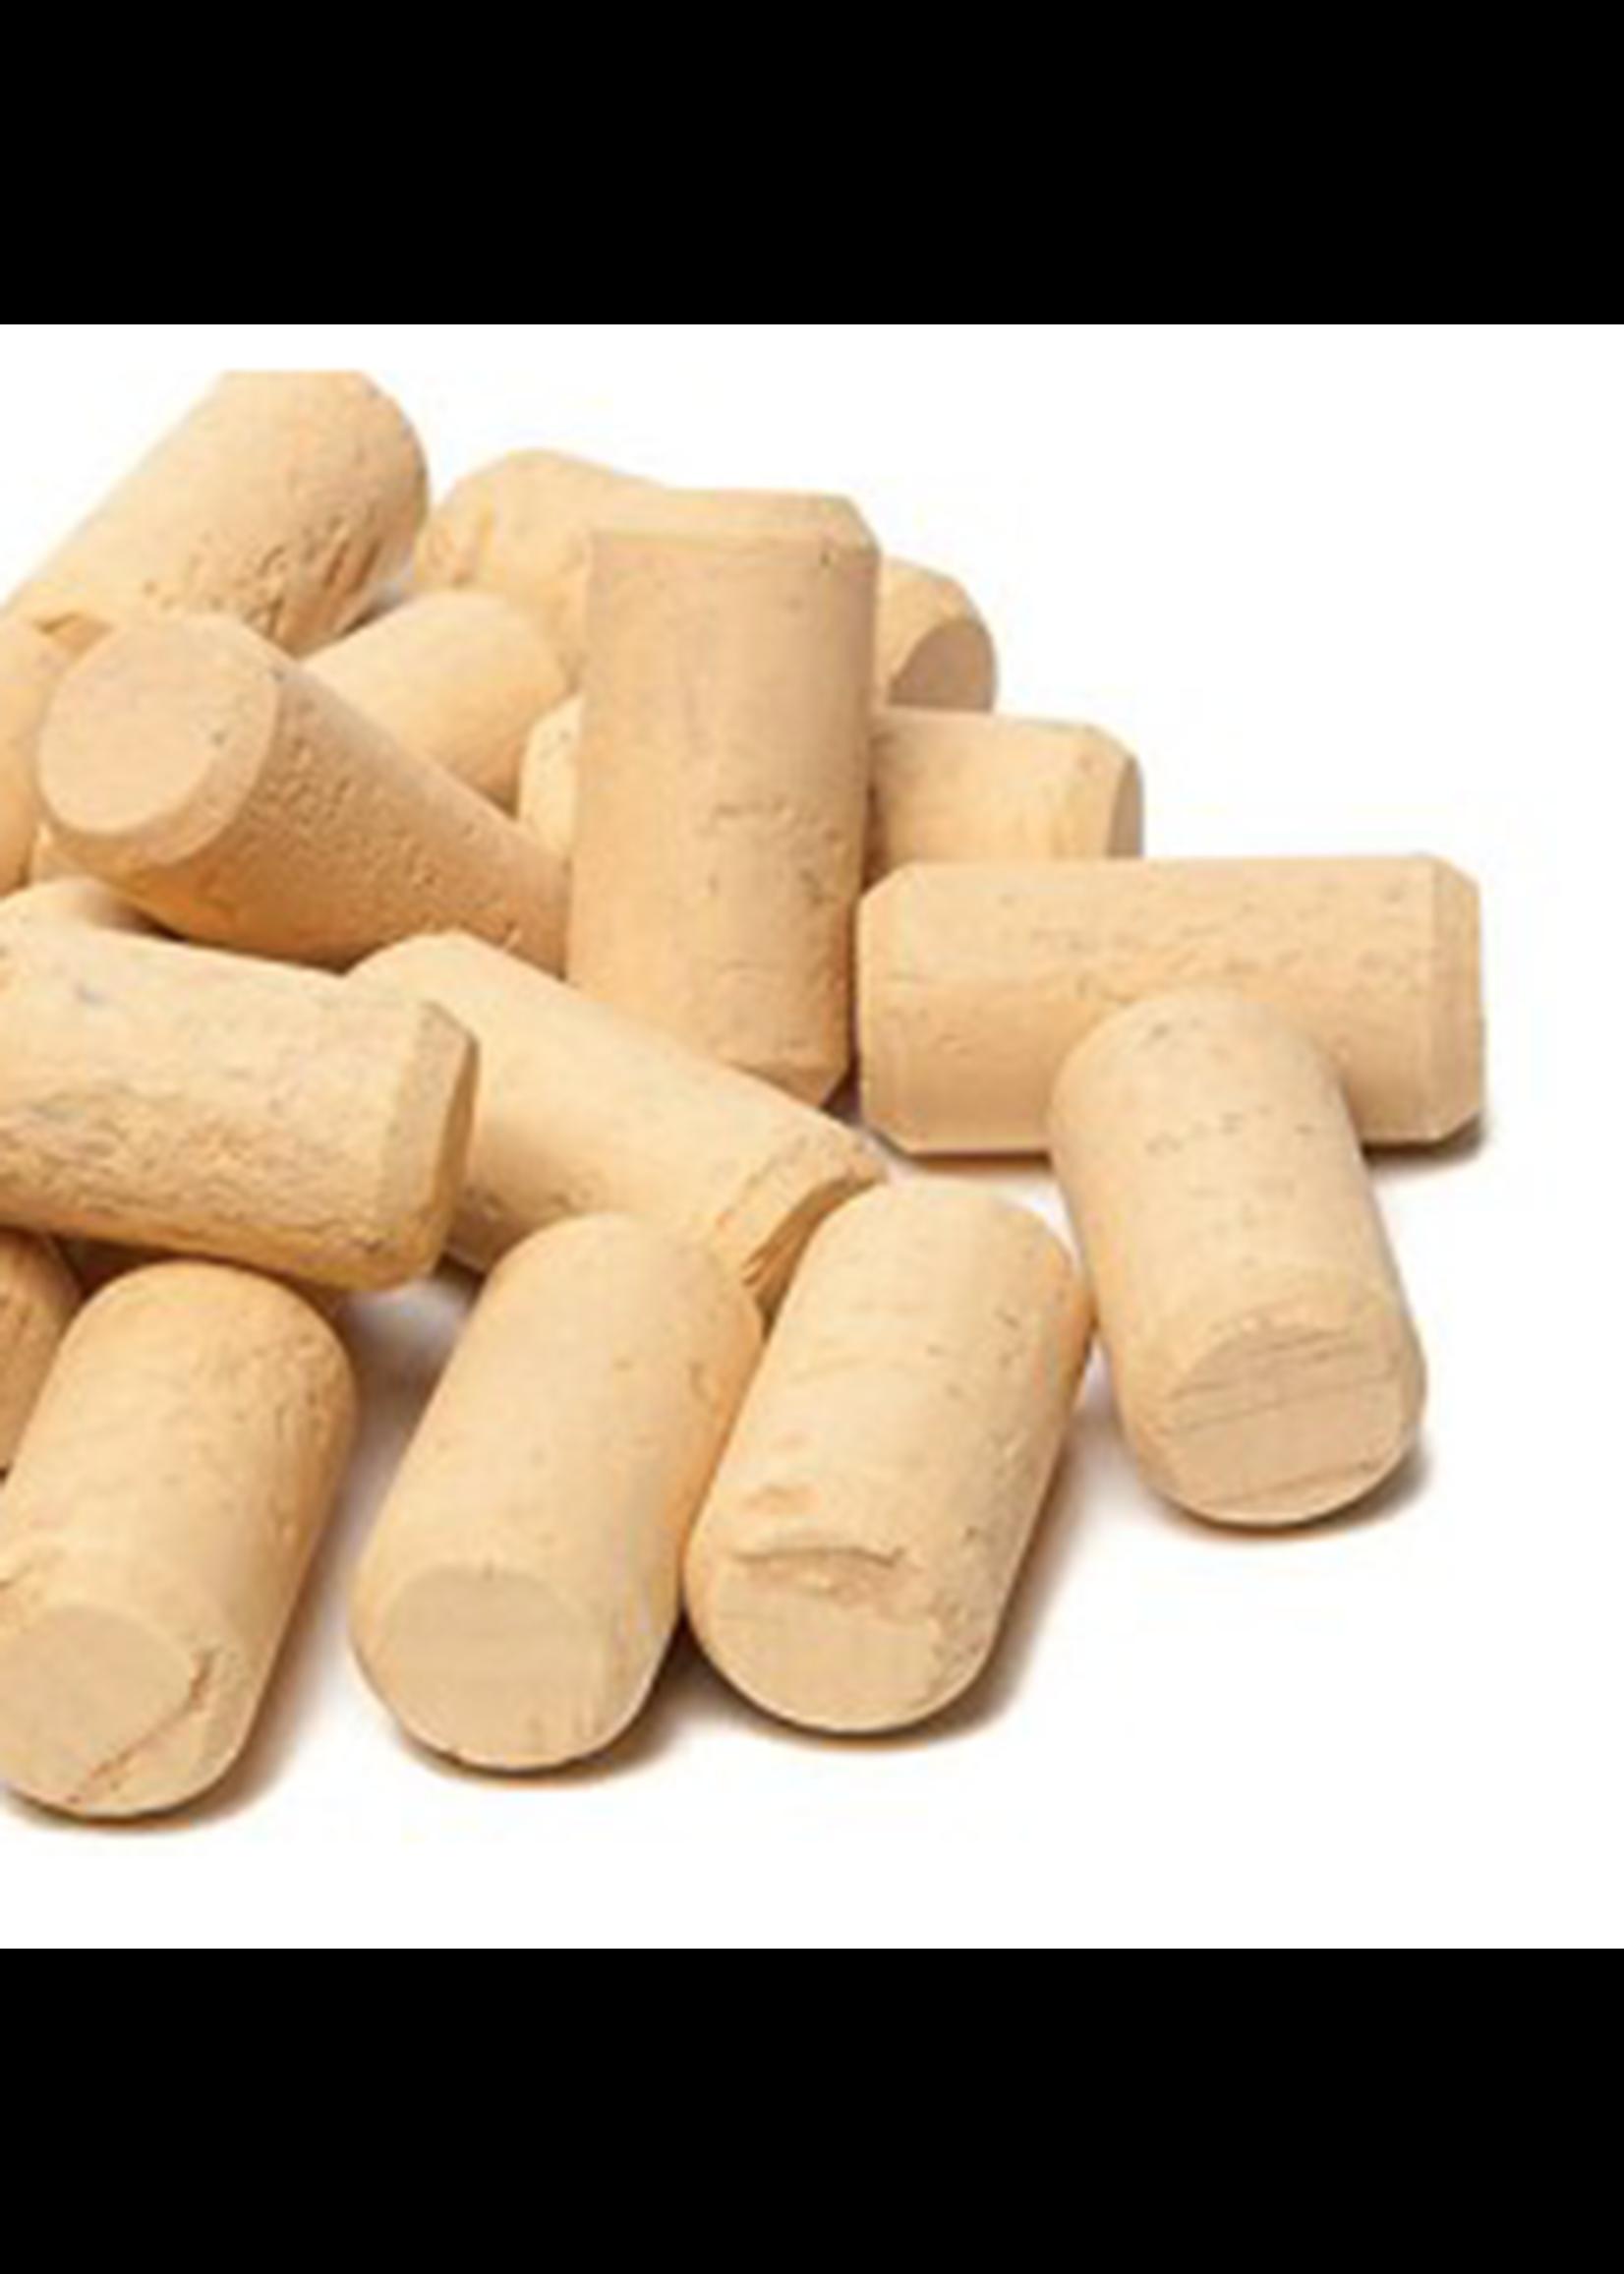 "Racking/Bottling Corks, Wine - #7 x 1 3/4"" First Quality (100/bag)"